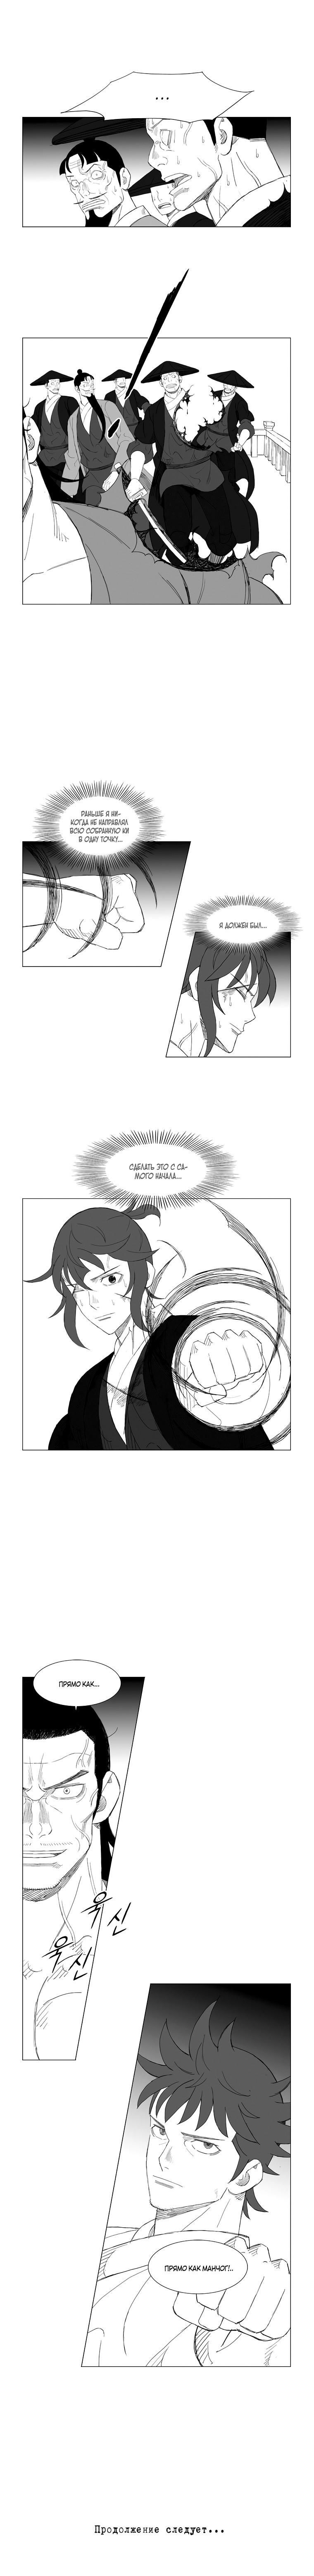 https://r1.ninemanga.com/comics/pic3/39/28263/1275882/1542235220334.jpg Page 6